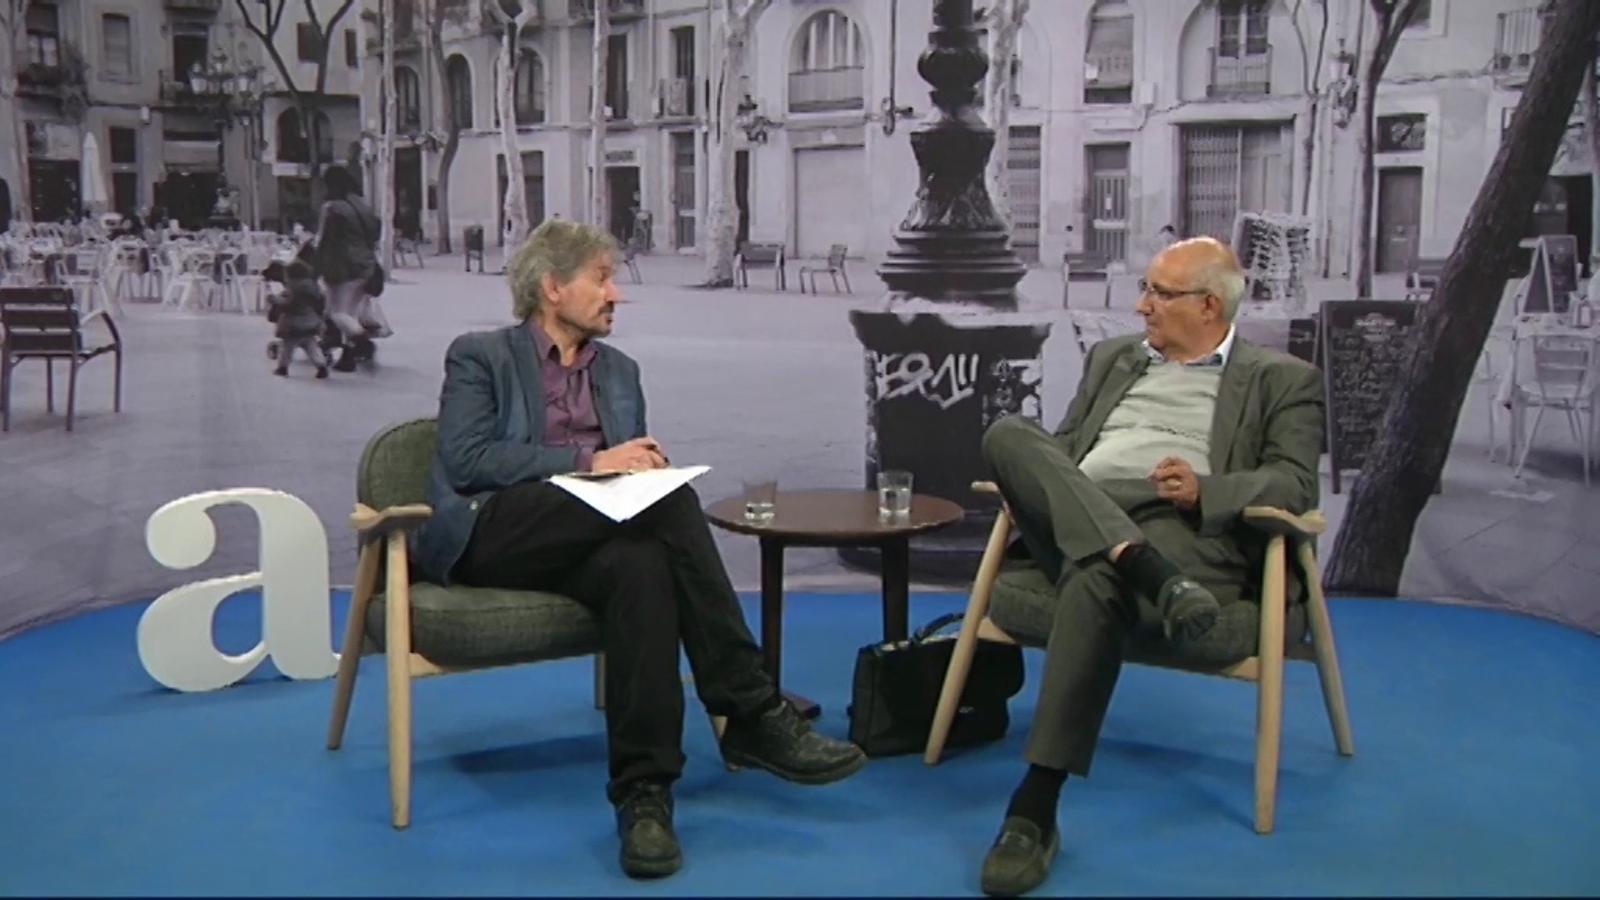 Entrevista de Carles Capdevila a Jorge Barudy